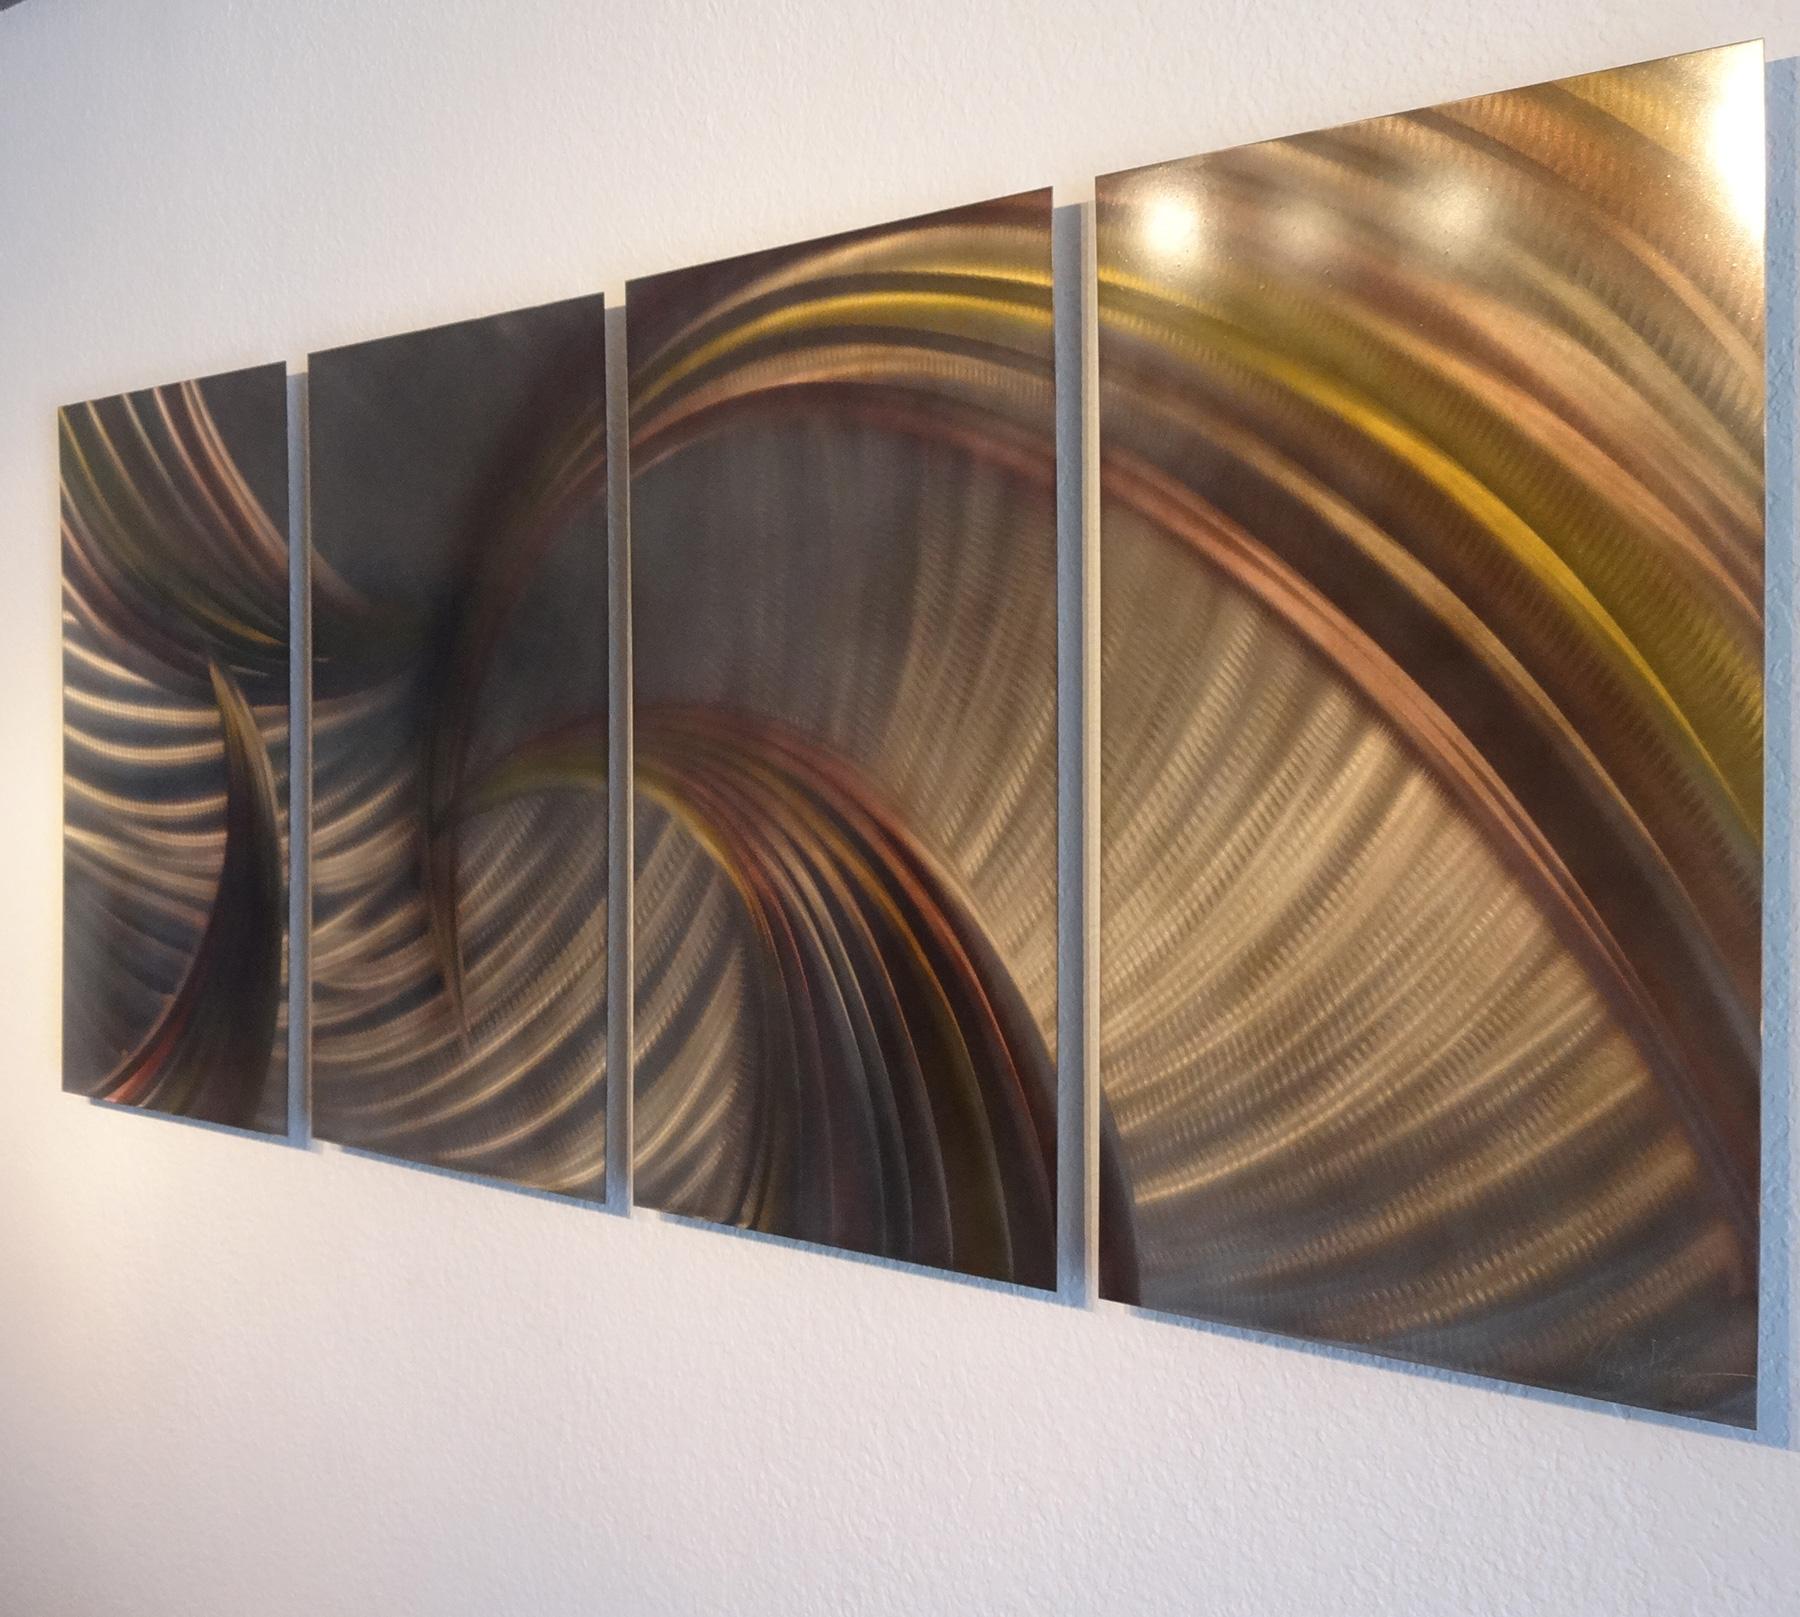 Tempest Bronze - Abstract Metal Wall Art Contemporary Modern Decor ...